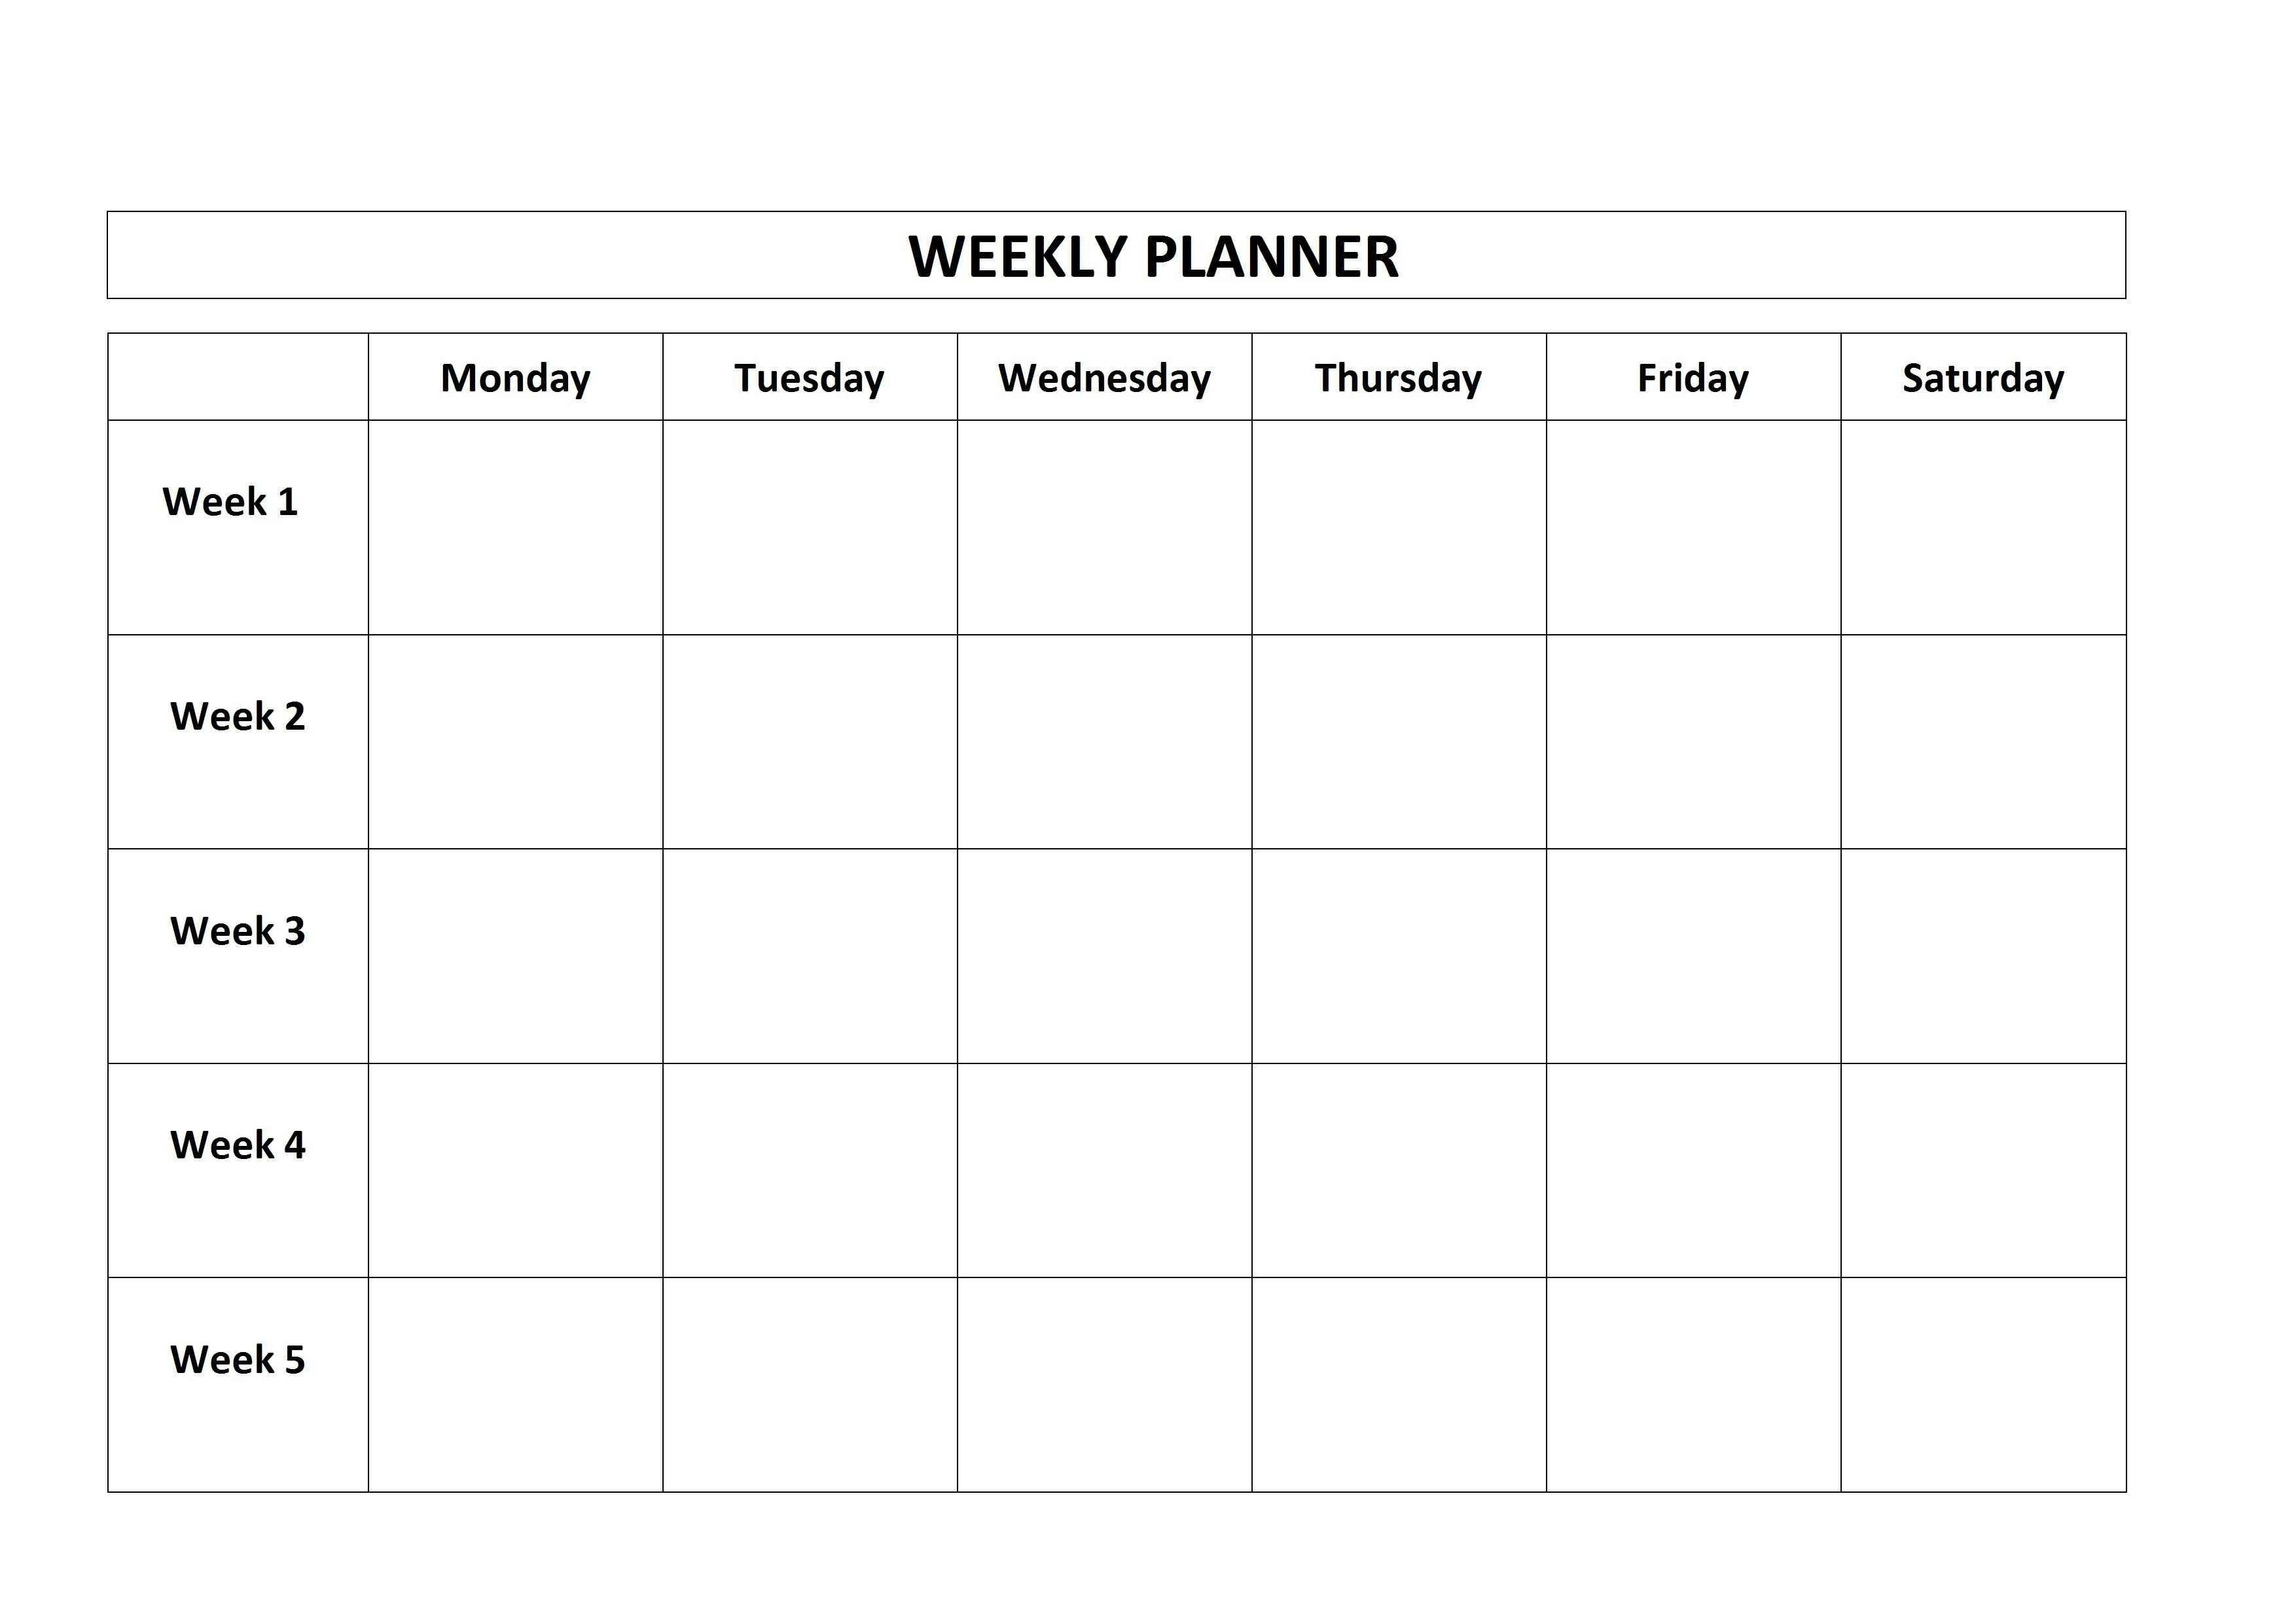 Free Printable Work Schedule Blank Schedules Calendar Weekly Planner Catch Weekly Calendar Template Weekly Calendar Planner Weekly Calendar Printable Monday to friday calendar template